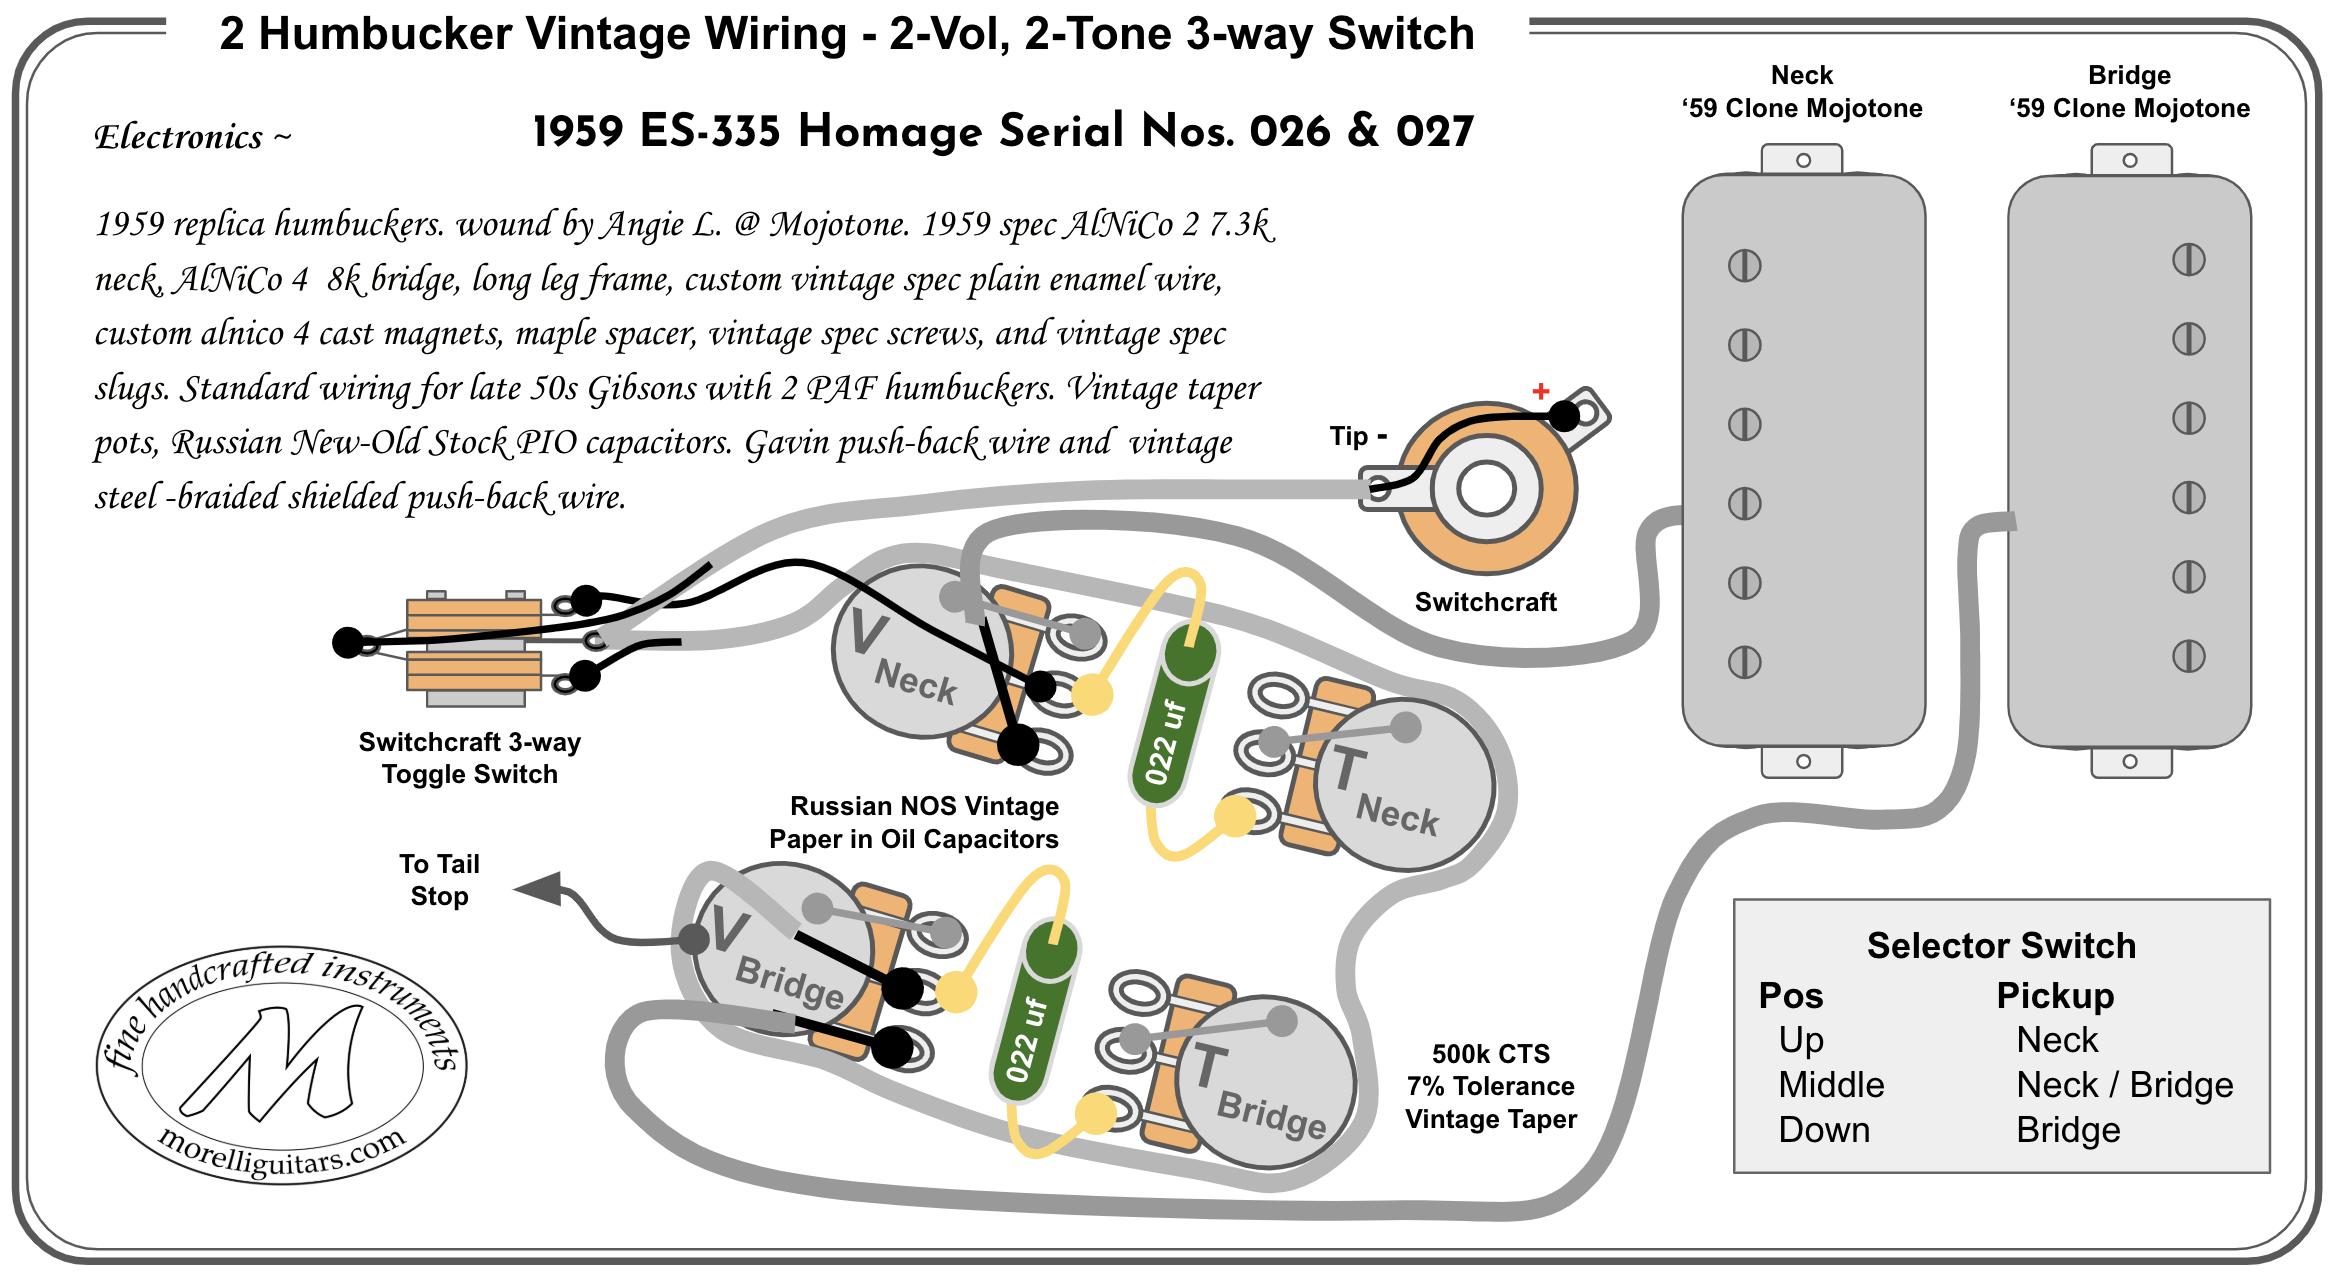 Guitar Wiring Diagram 2 Humbucker from morelliguitars.com